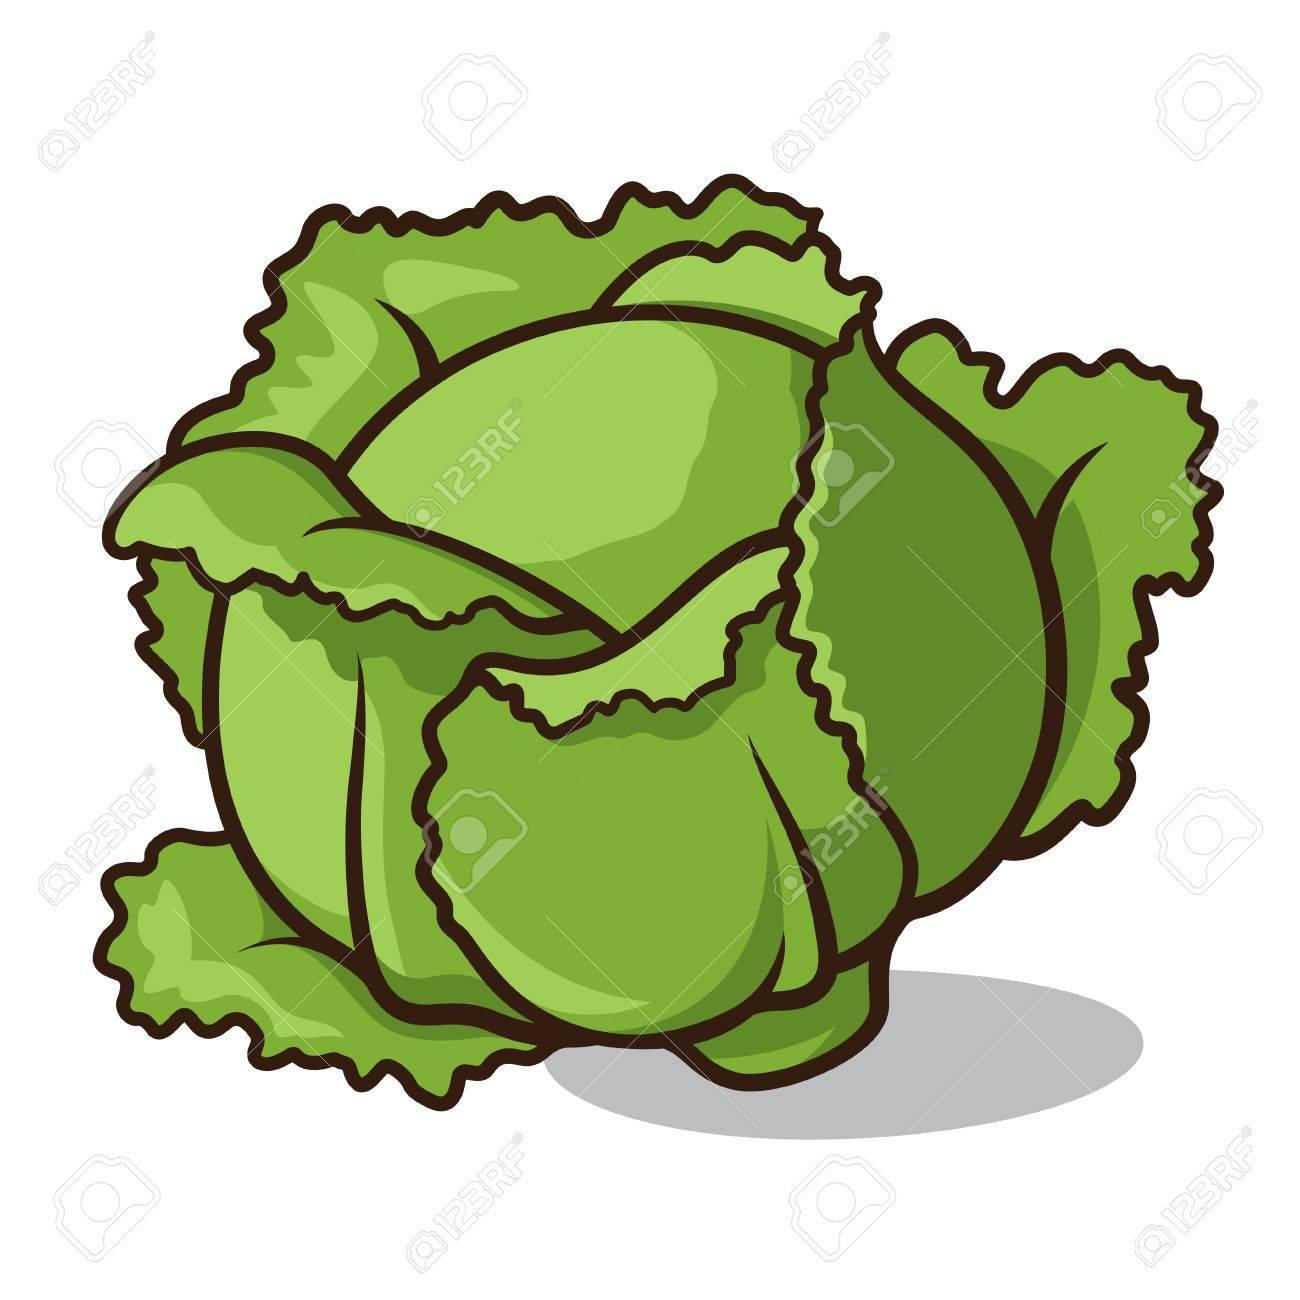 Broccoli clipart lettuce. Drawn redhead haired cartoon